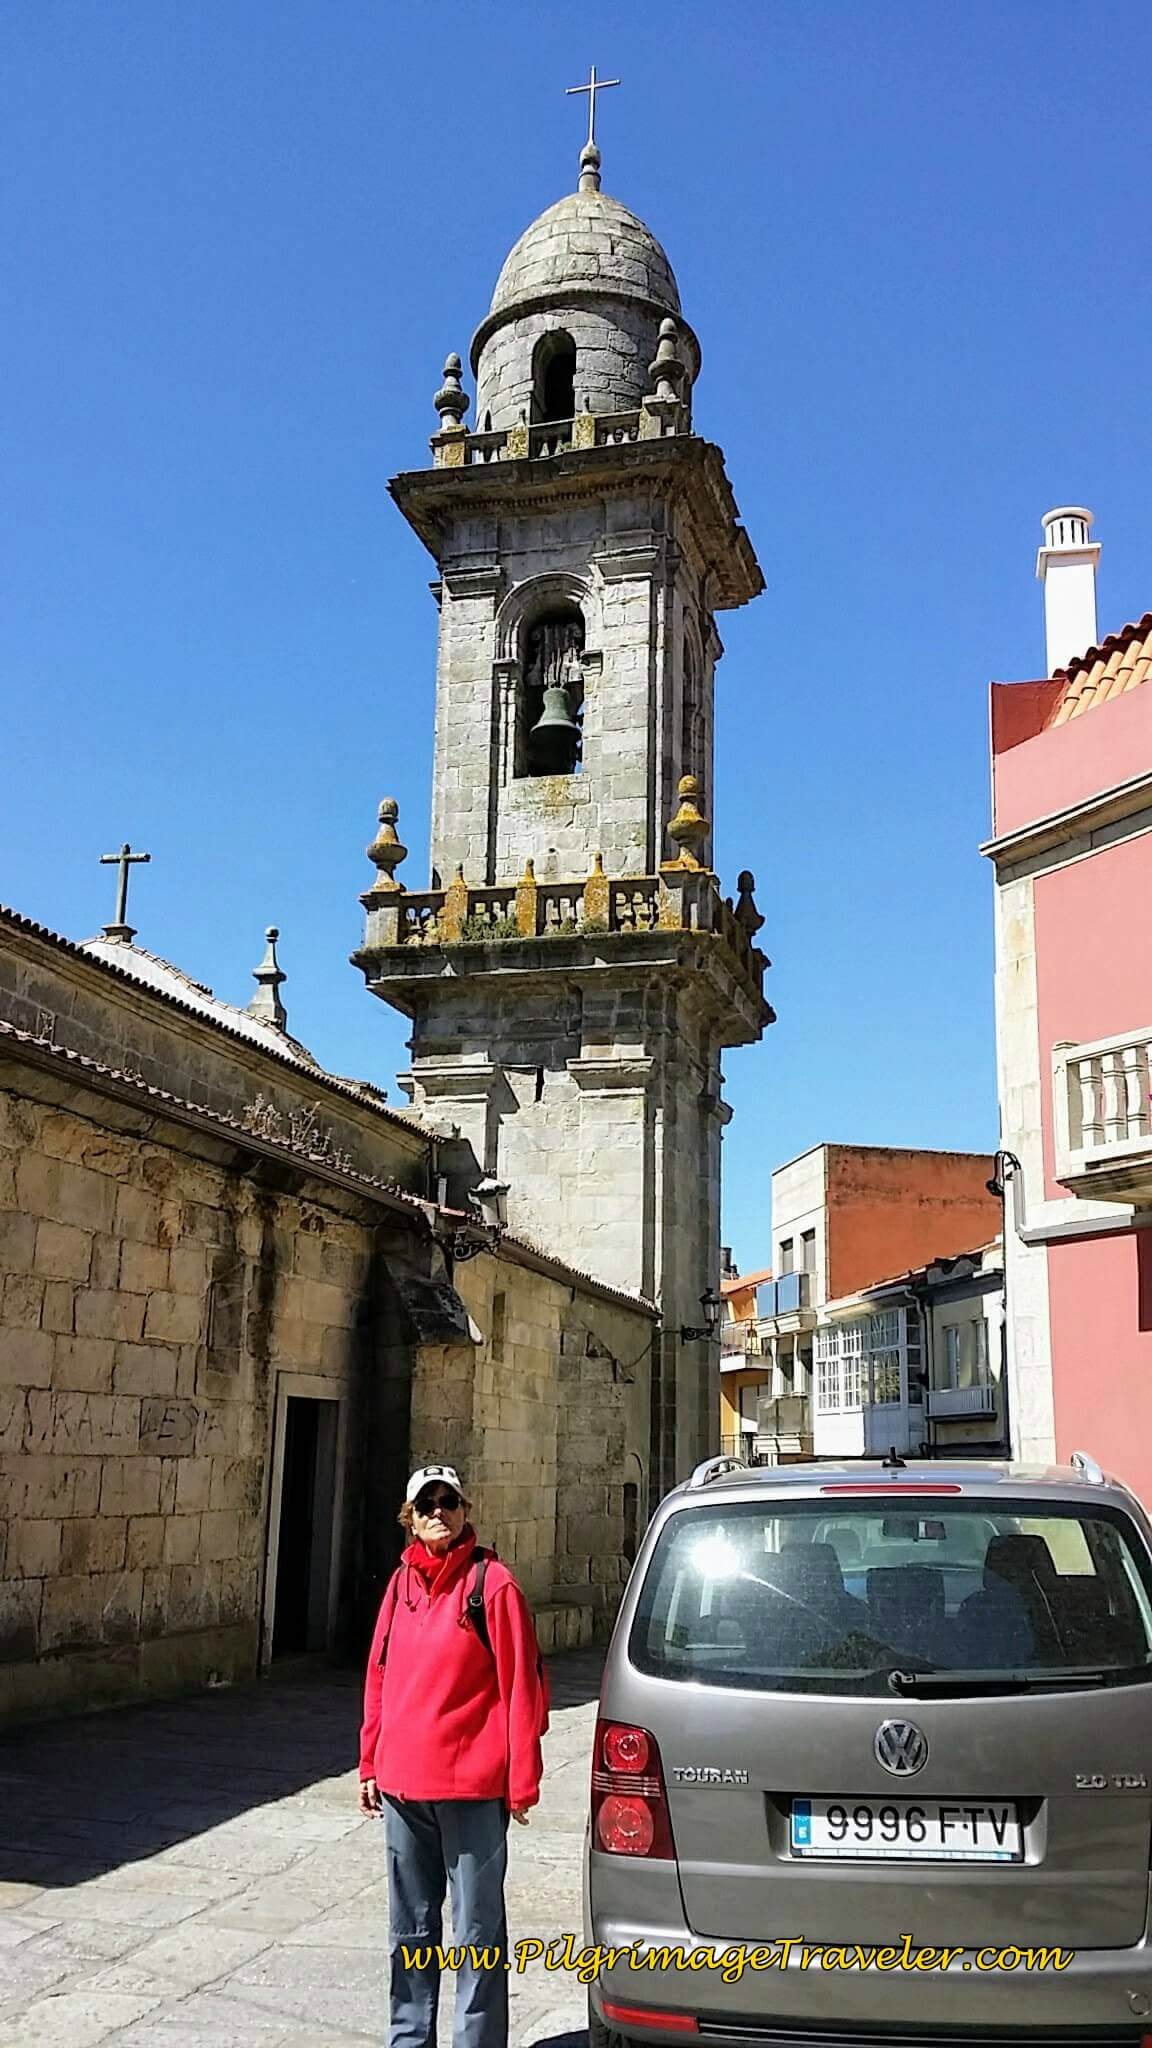 Glyvia at the Parroquia de Santa María on Day Nineteen of the Portuguese Way